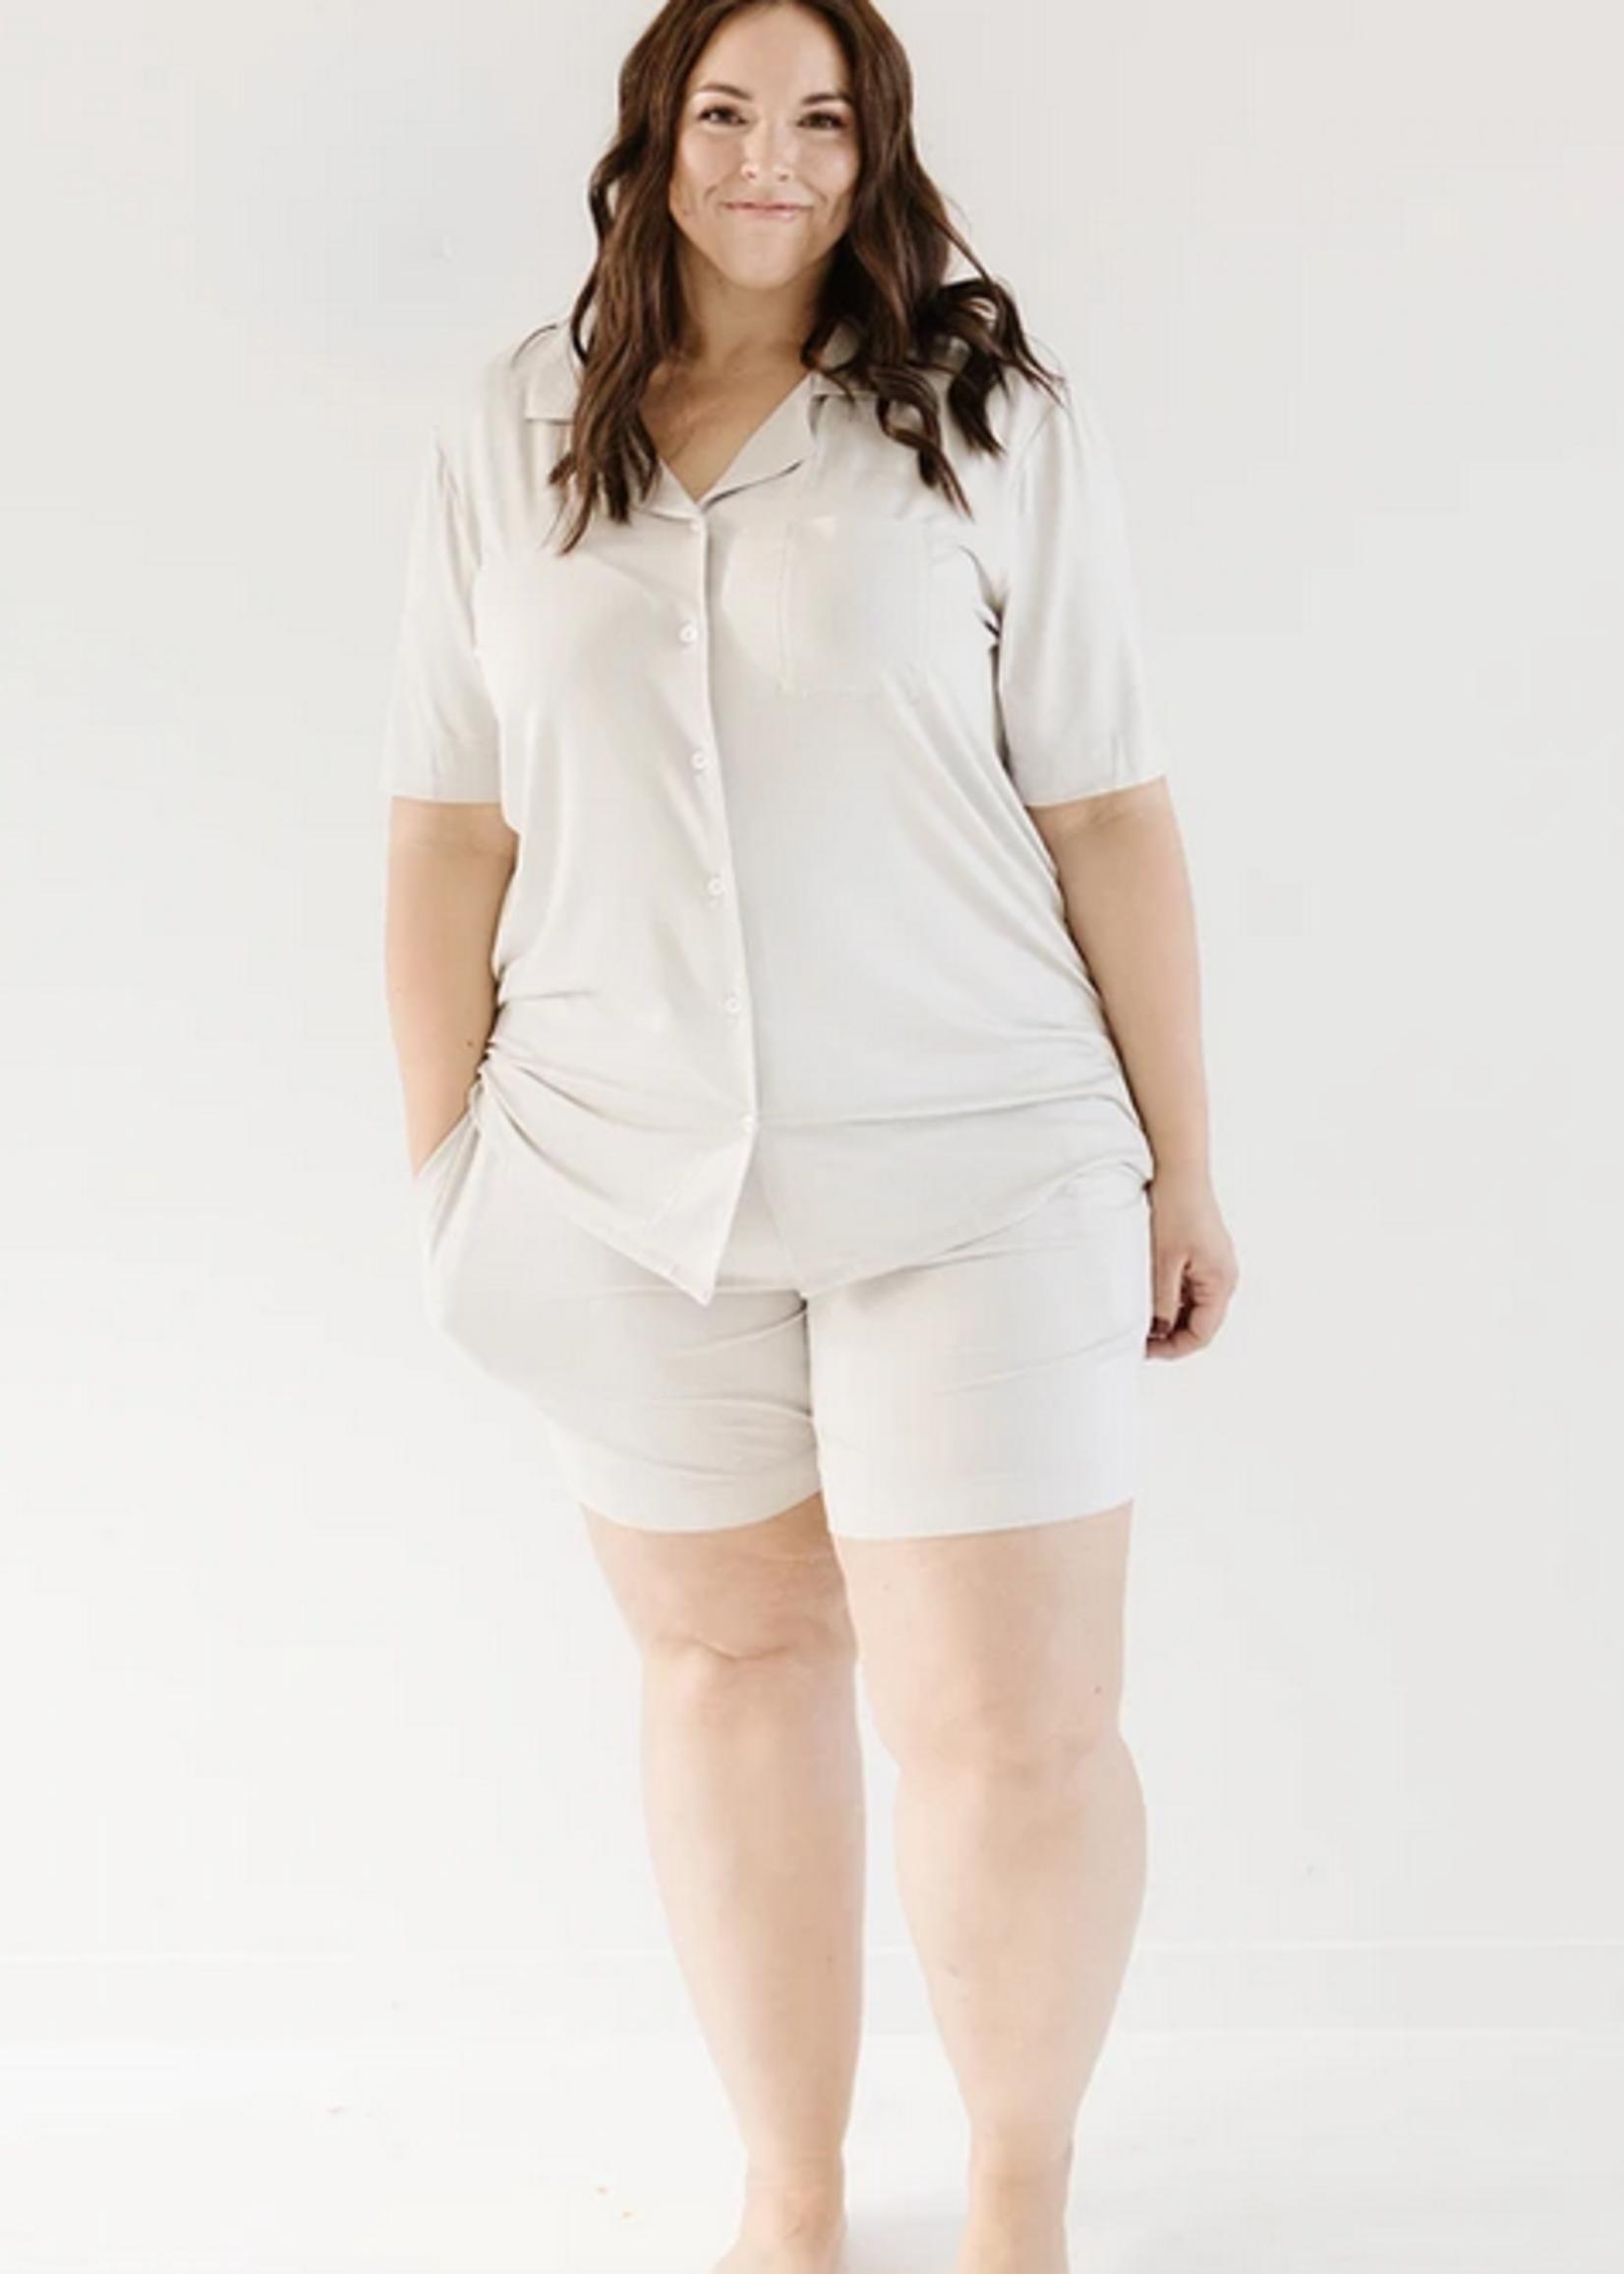 Elitaire Petite Short Sleeve Dream Set in Grey